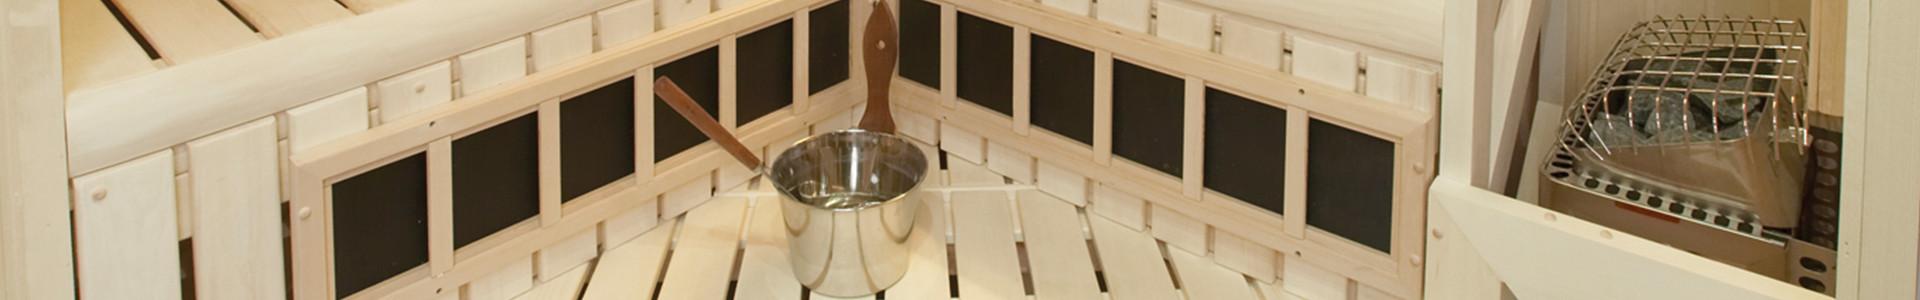 3 Benefits of Using a Sauna at Home, Des Moines Sauna Store